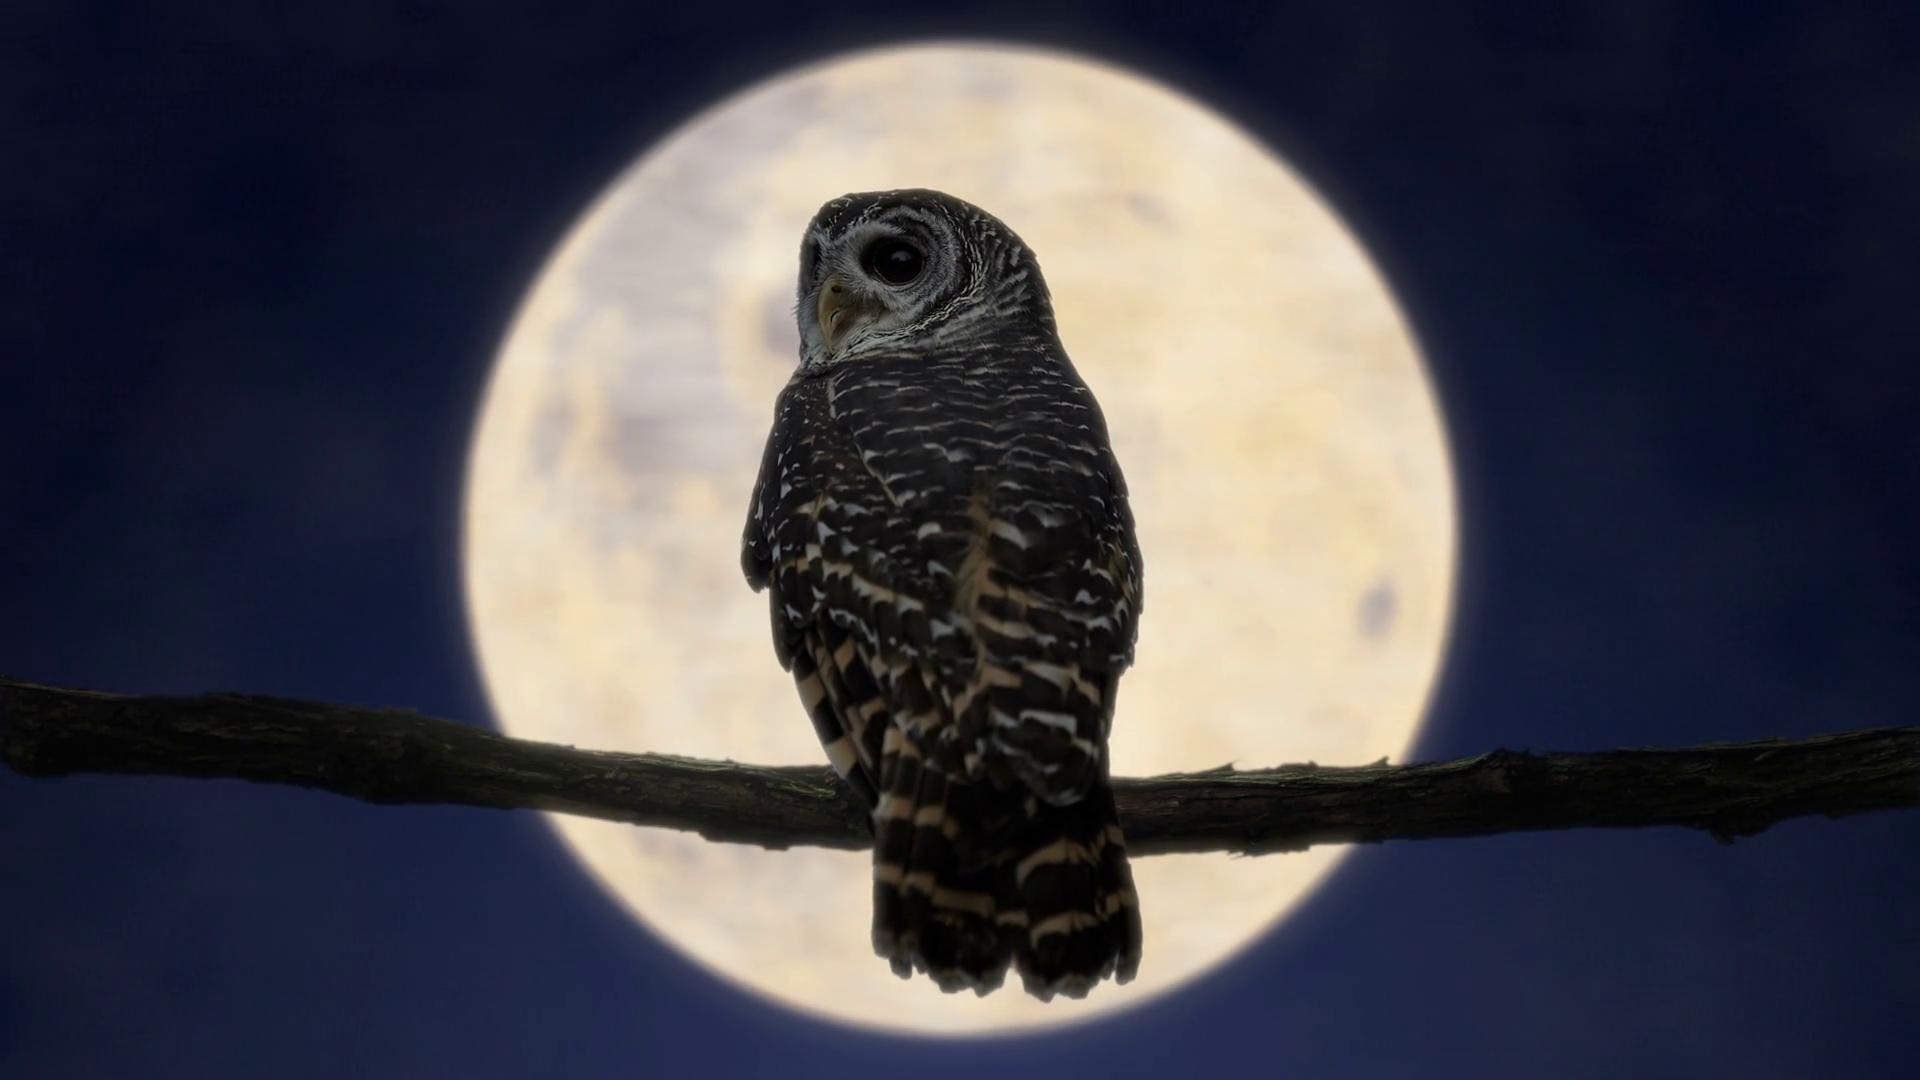 giới thiệu - owlvietnam